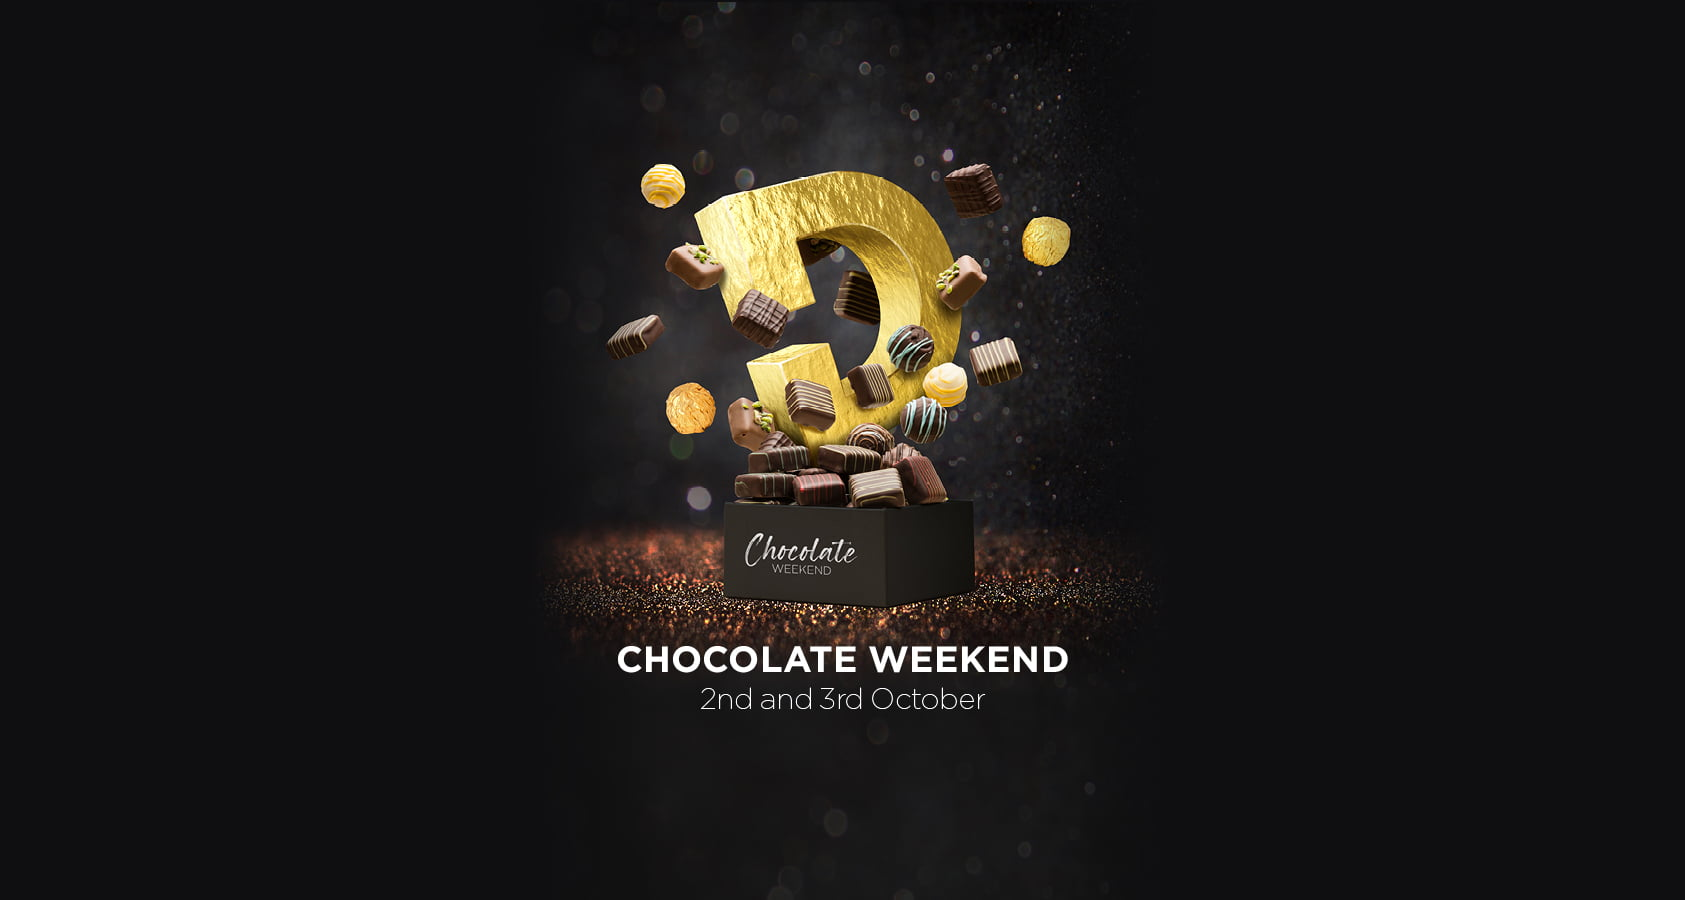 Chocolate Weekend